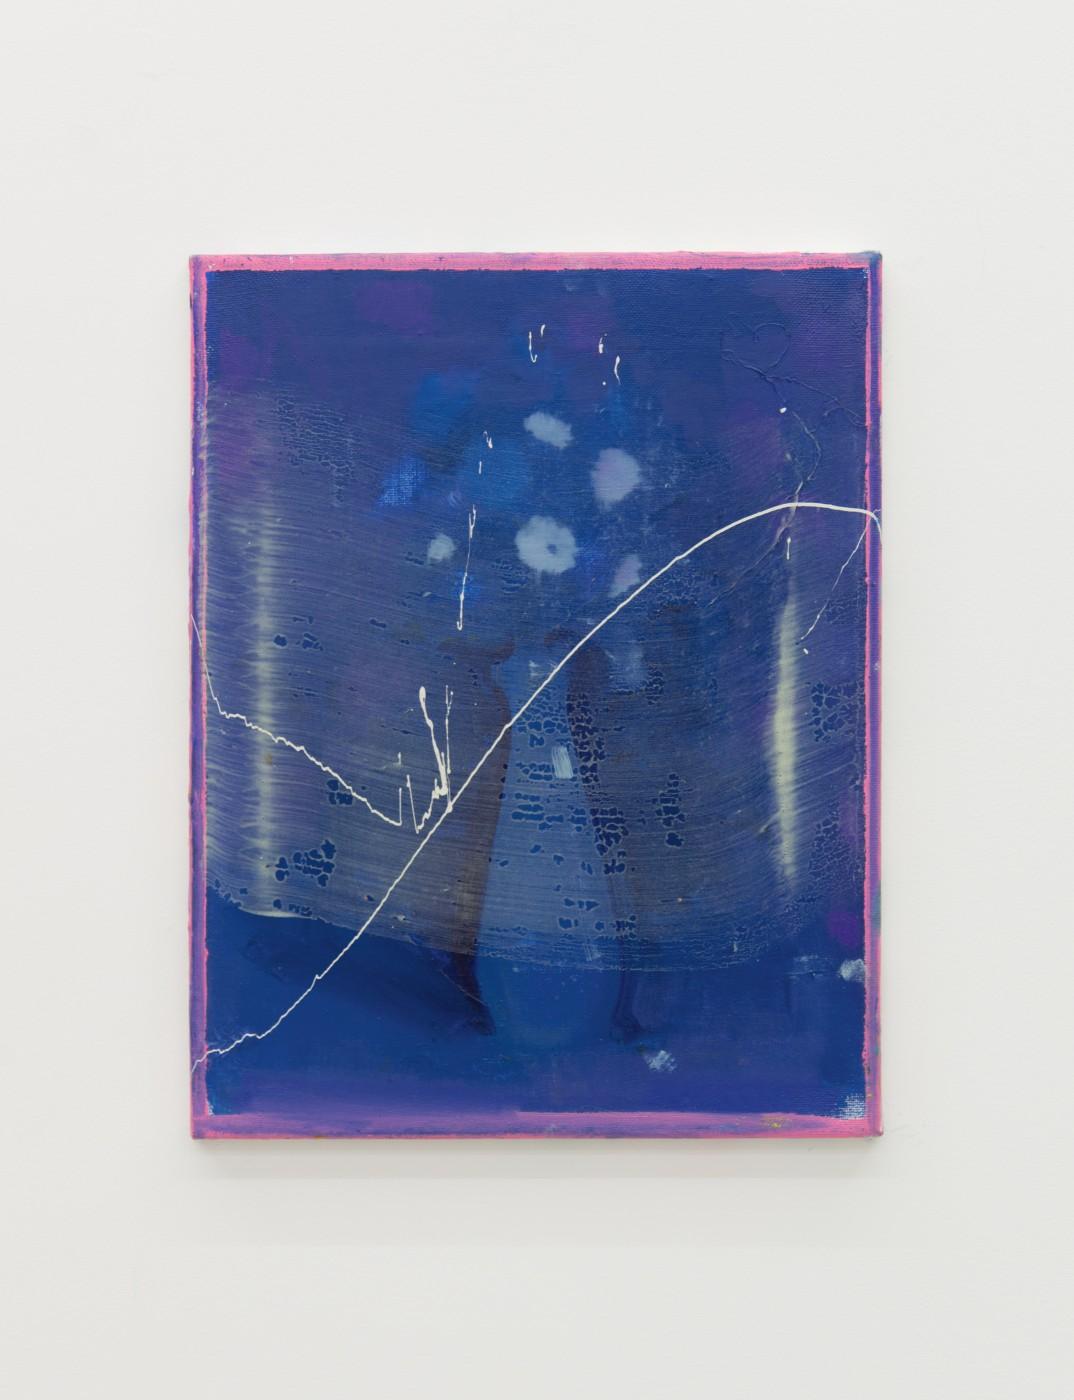 WALLFLOWERS, MALFLOWERS  Small Flower 1 , 2018  Oil on canvas  35 x 27,5 cm / 14 x 11 in  Nathan Zeidman